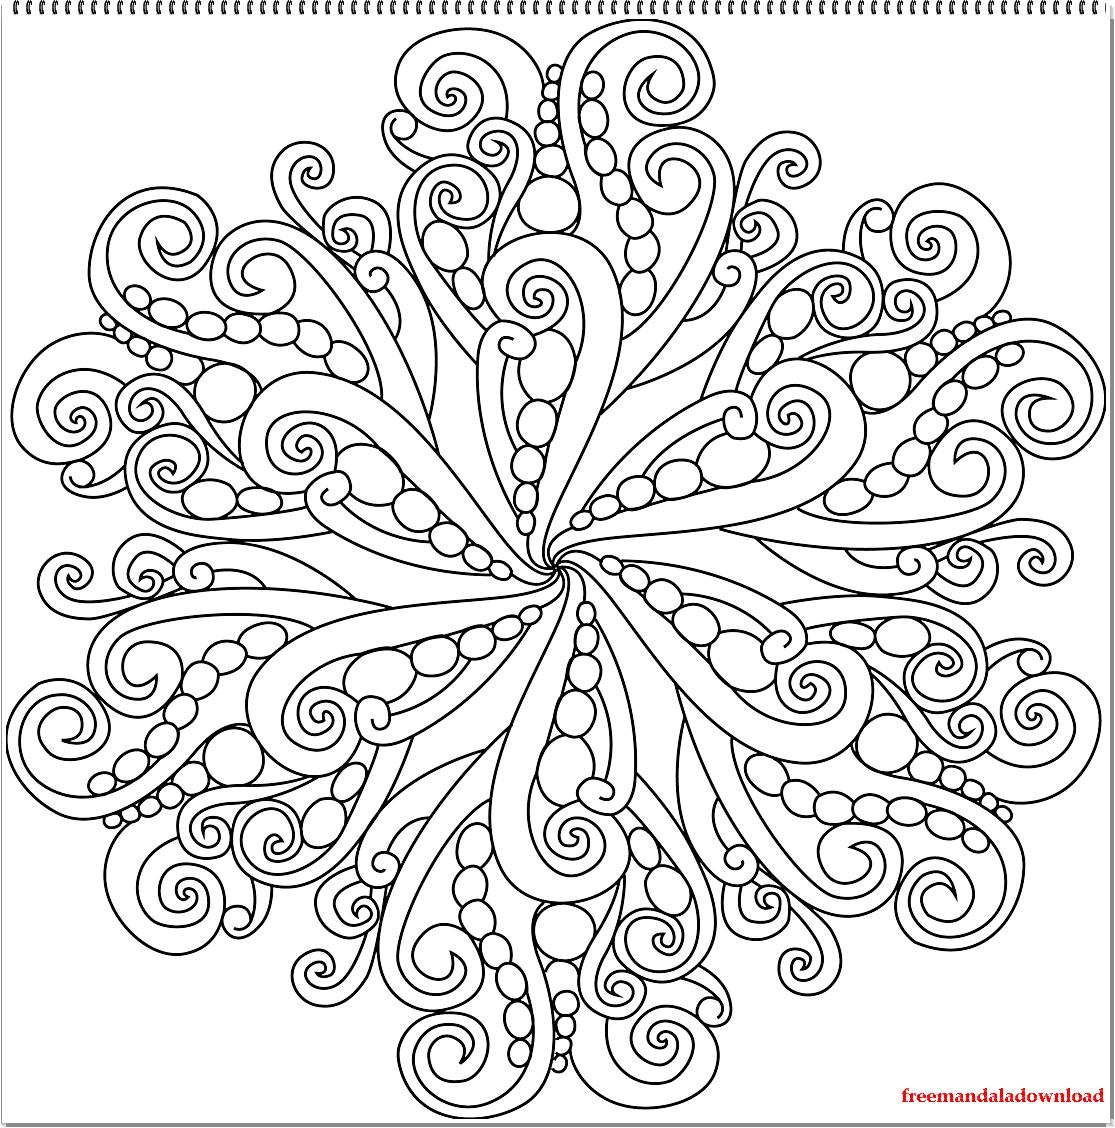 mandala malvorlagen zum ausdruckenmandala coloring pages